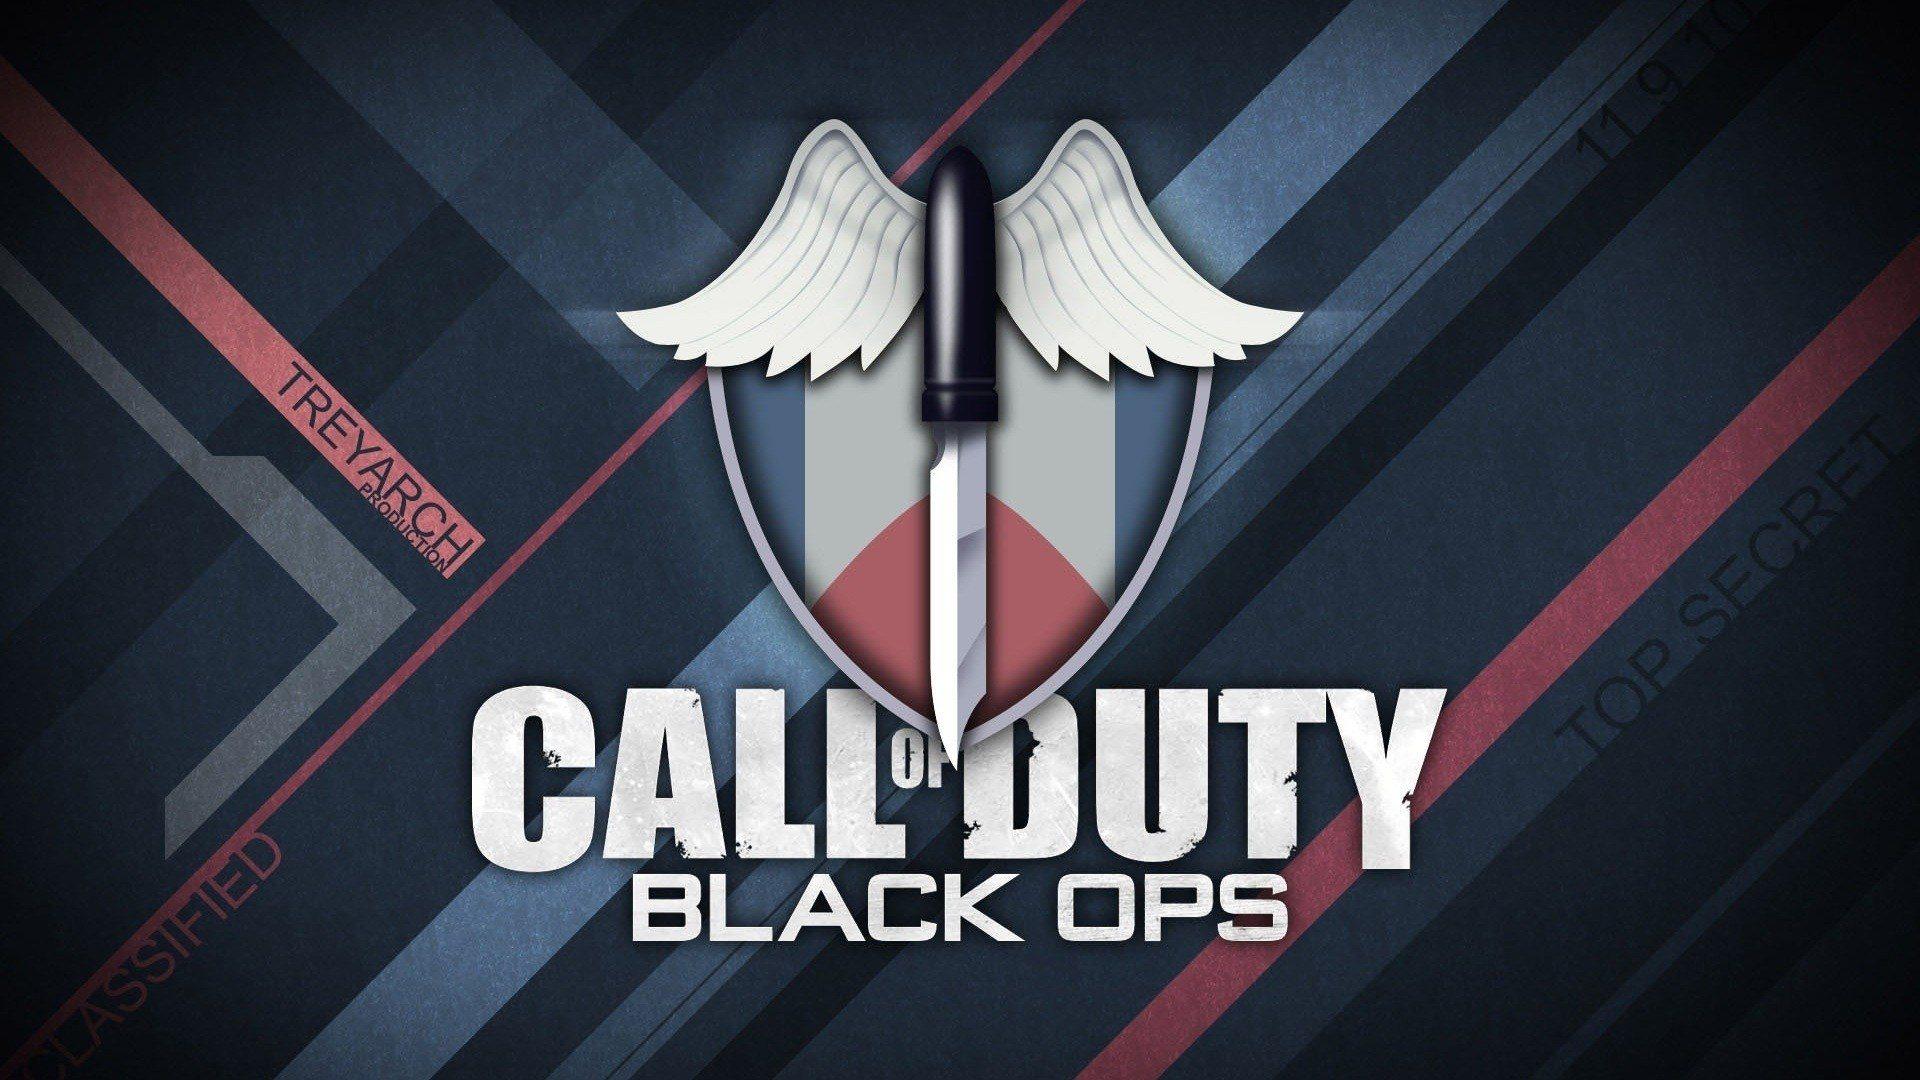 trololo blogg: Full Hd Wallpaper Black Ops